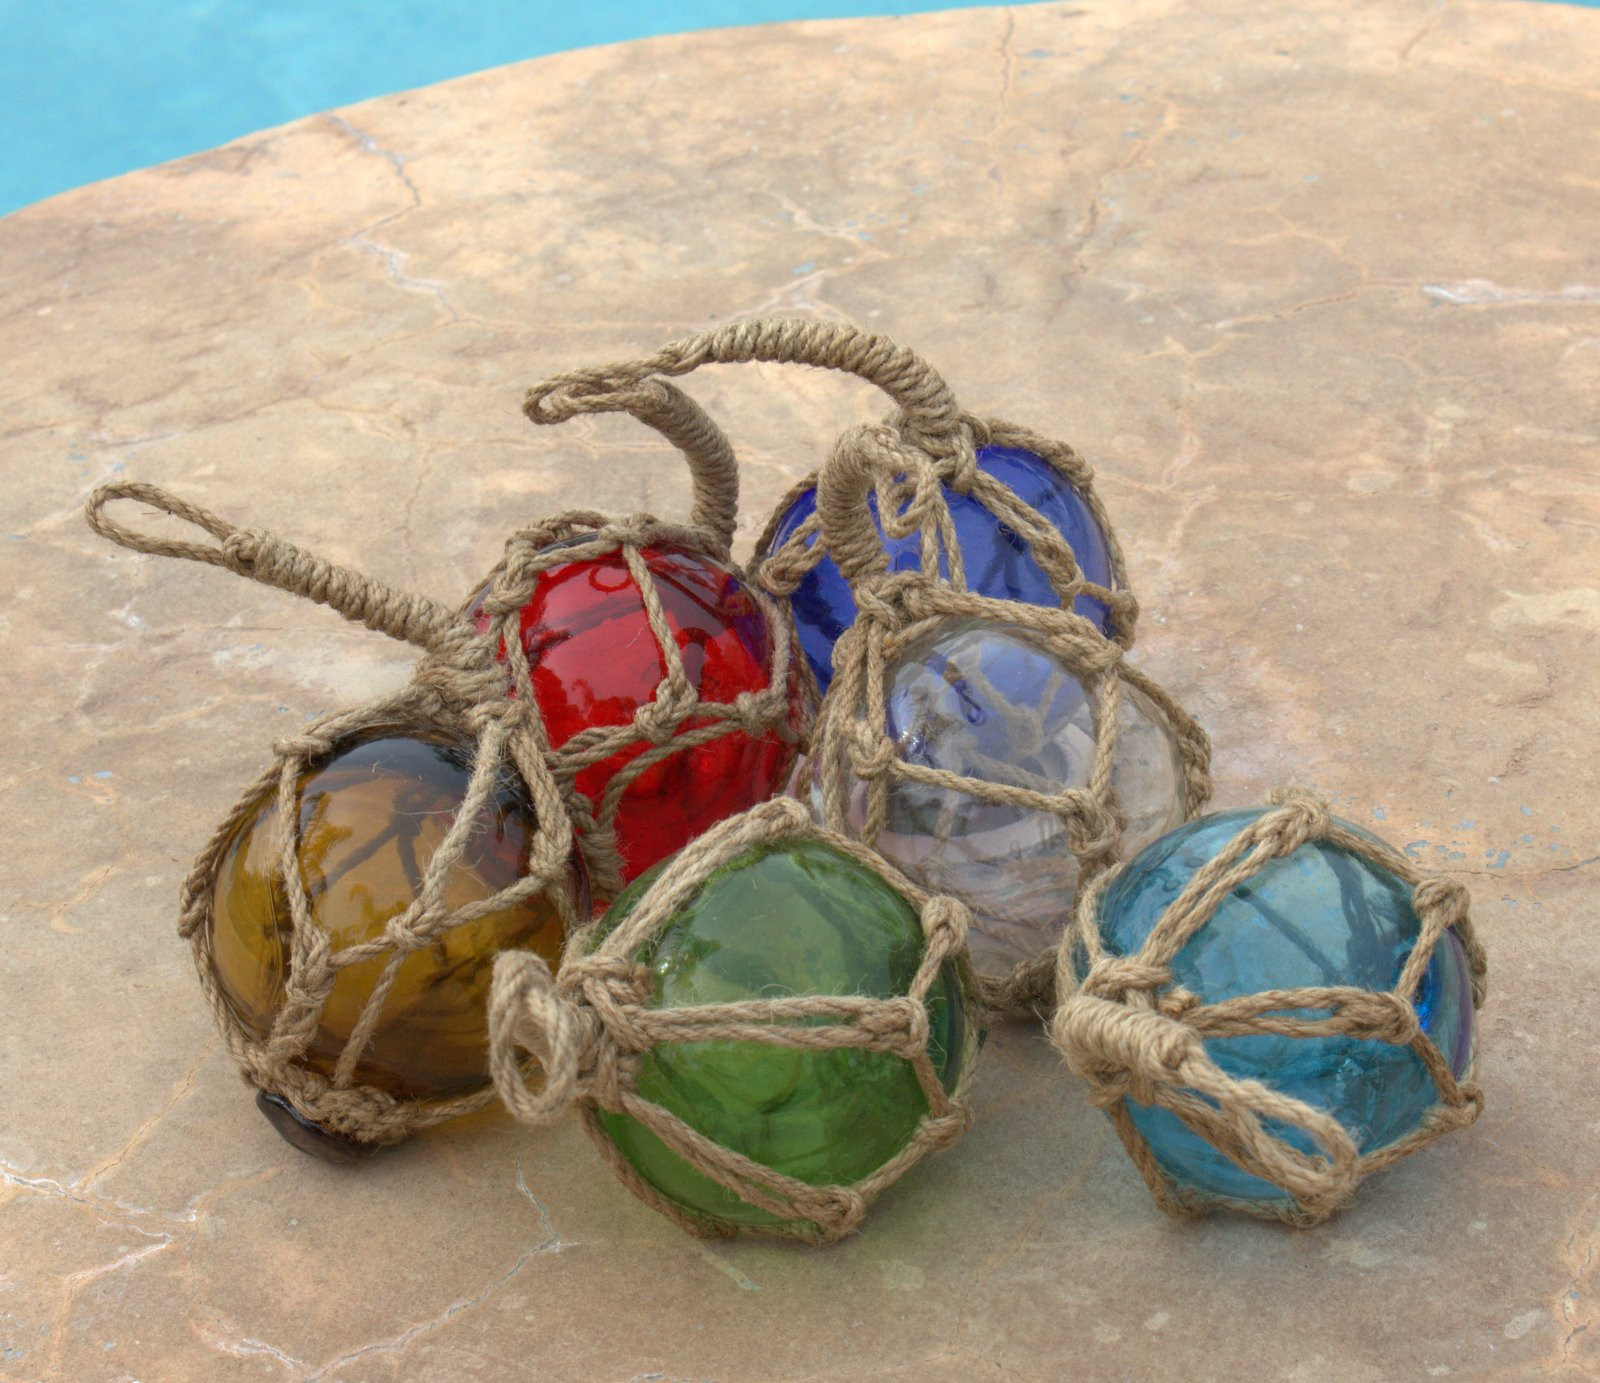 Japanese Glass Fishing Floats Fish Net Buoys Miniature Set of 6